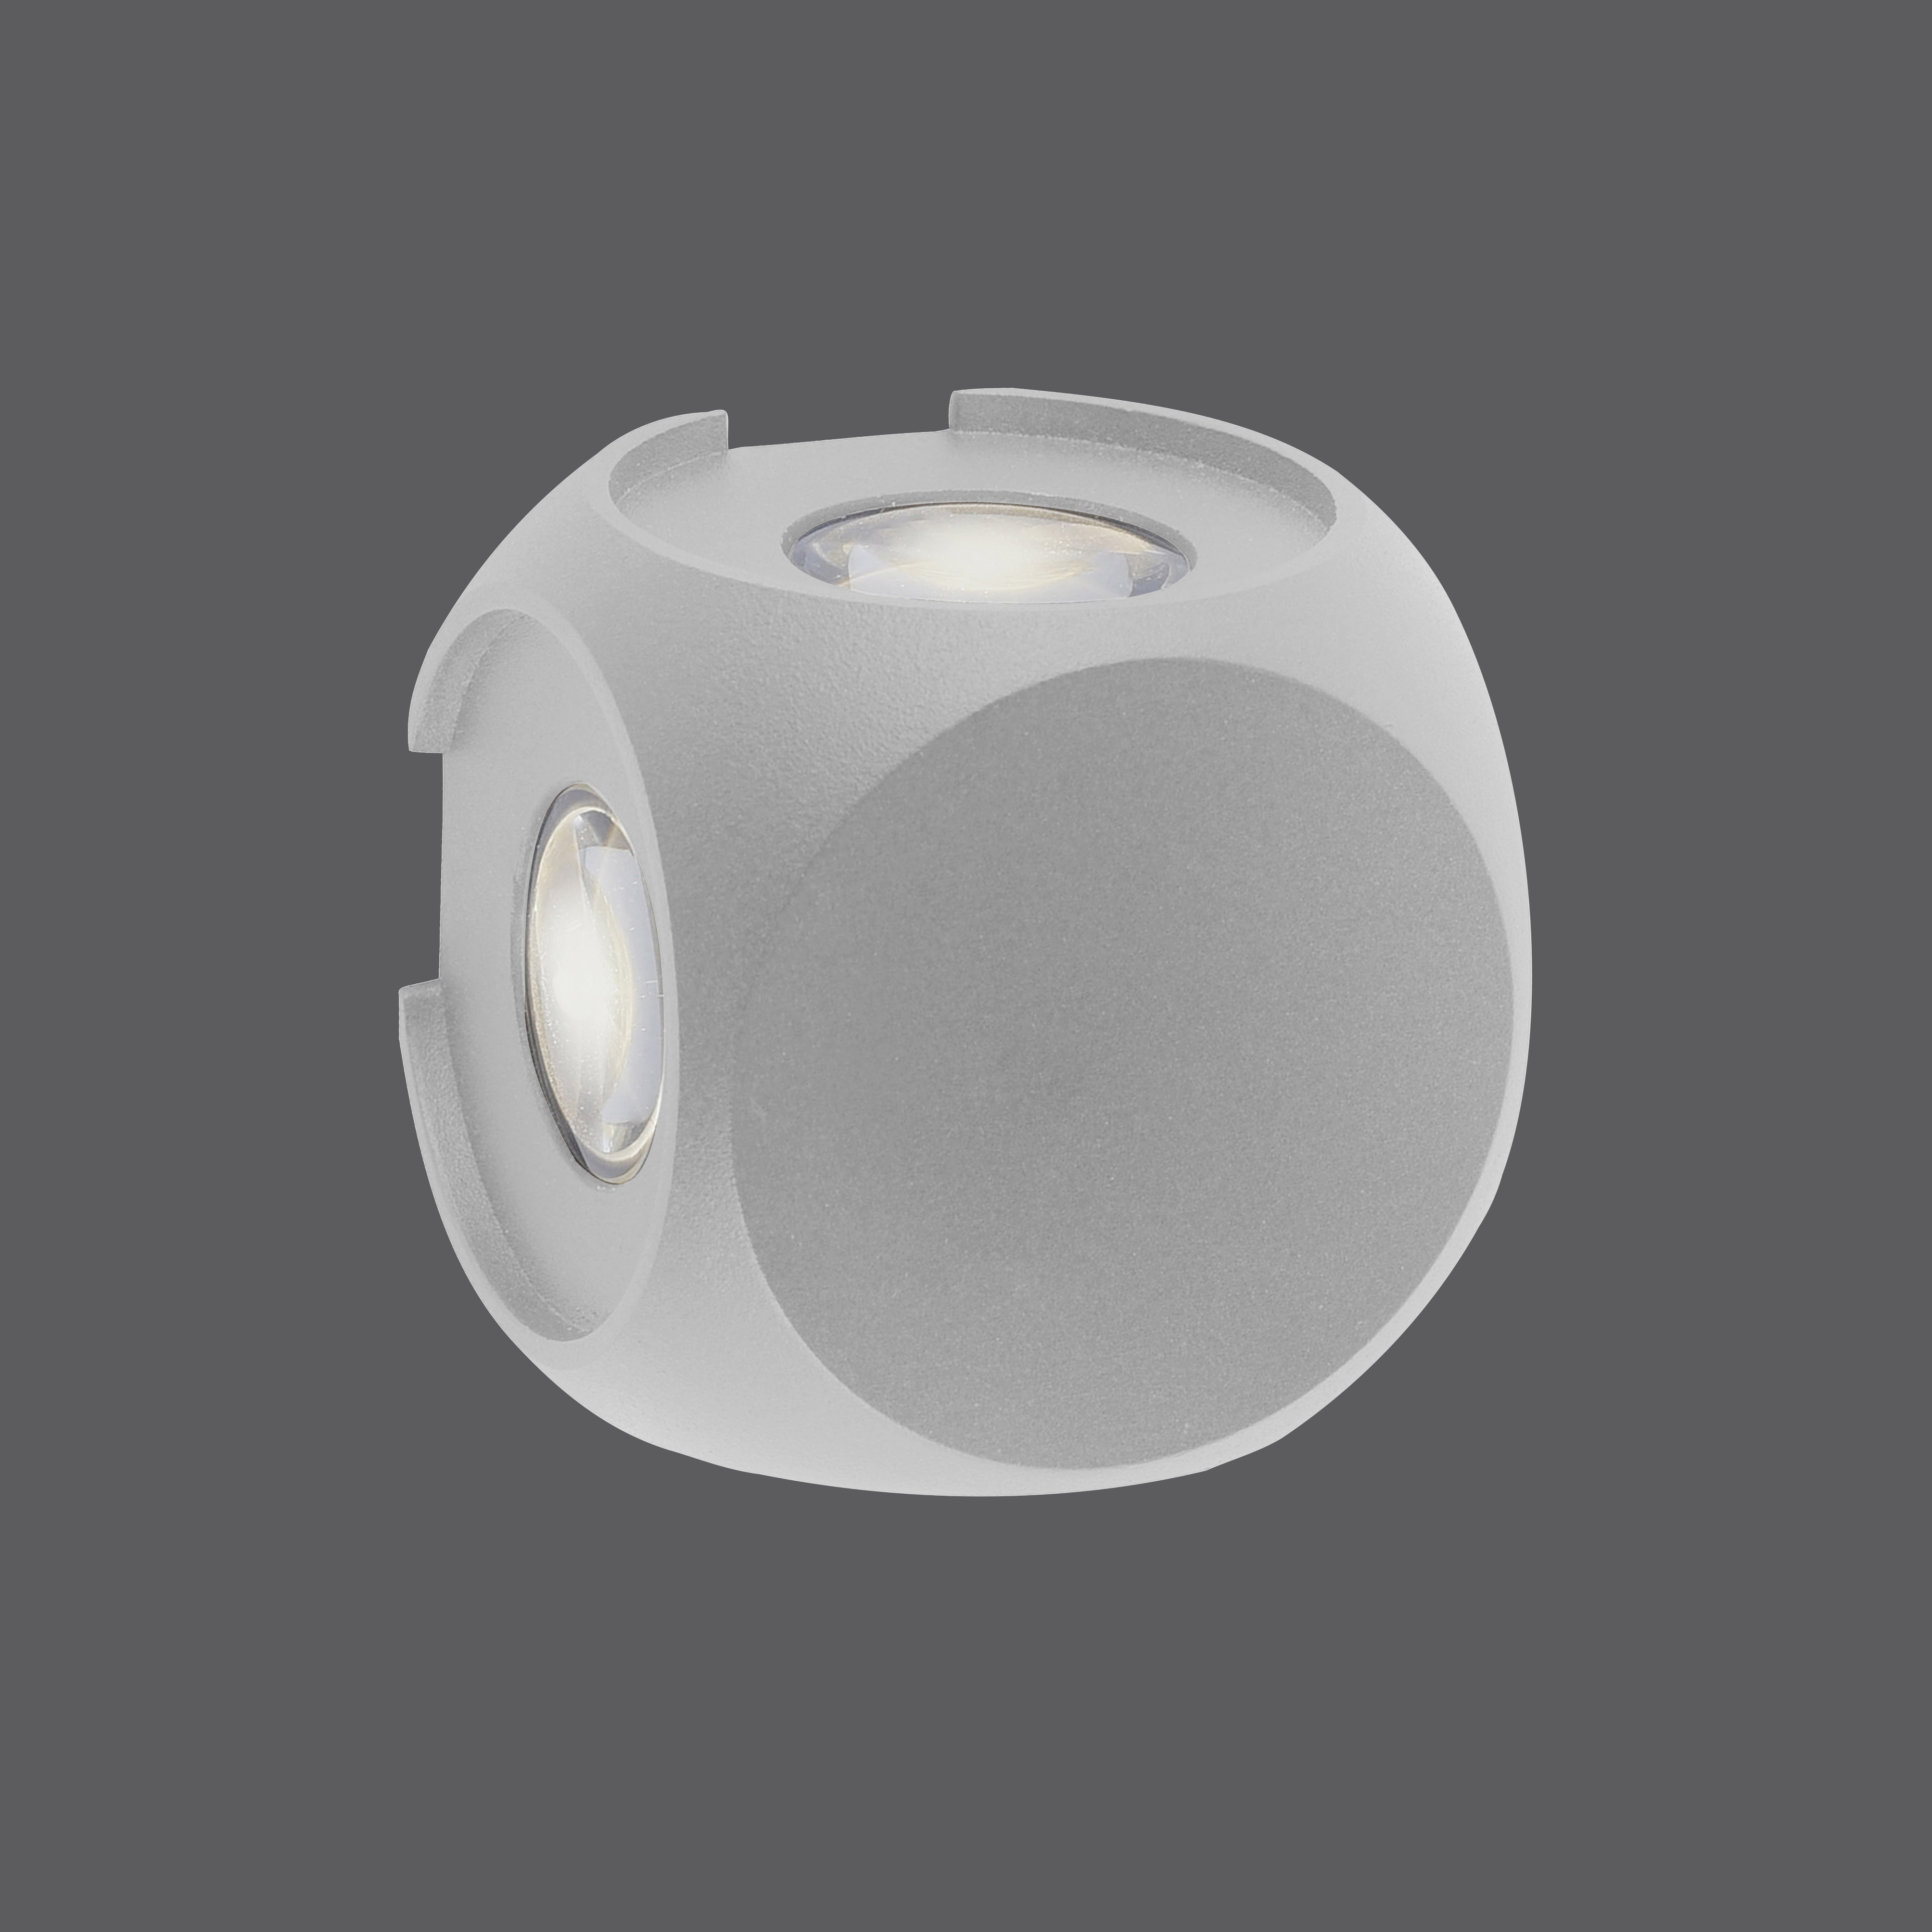 CARLO LED-Wandleuchte